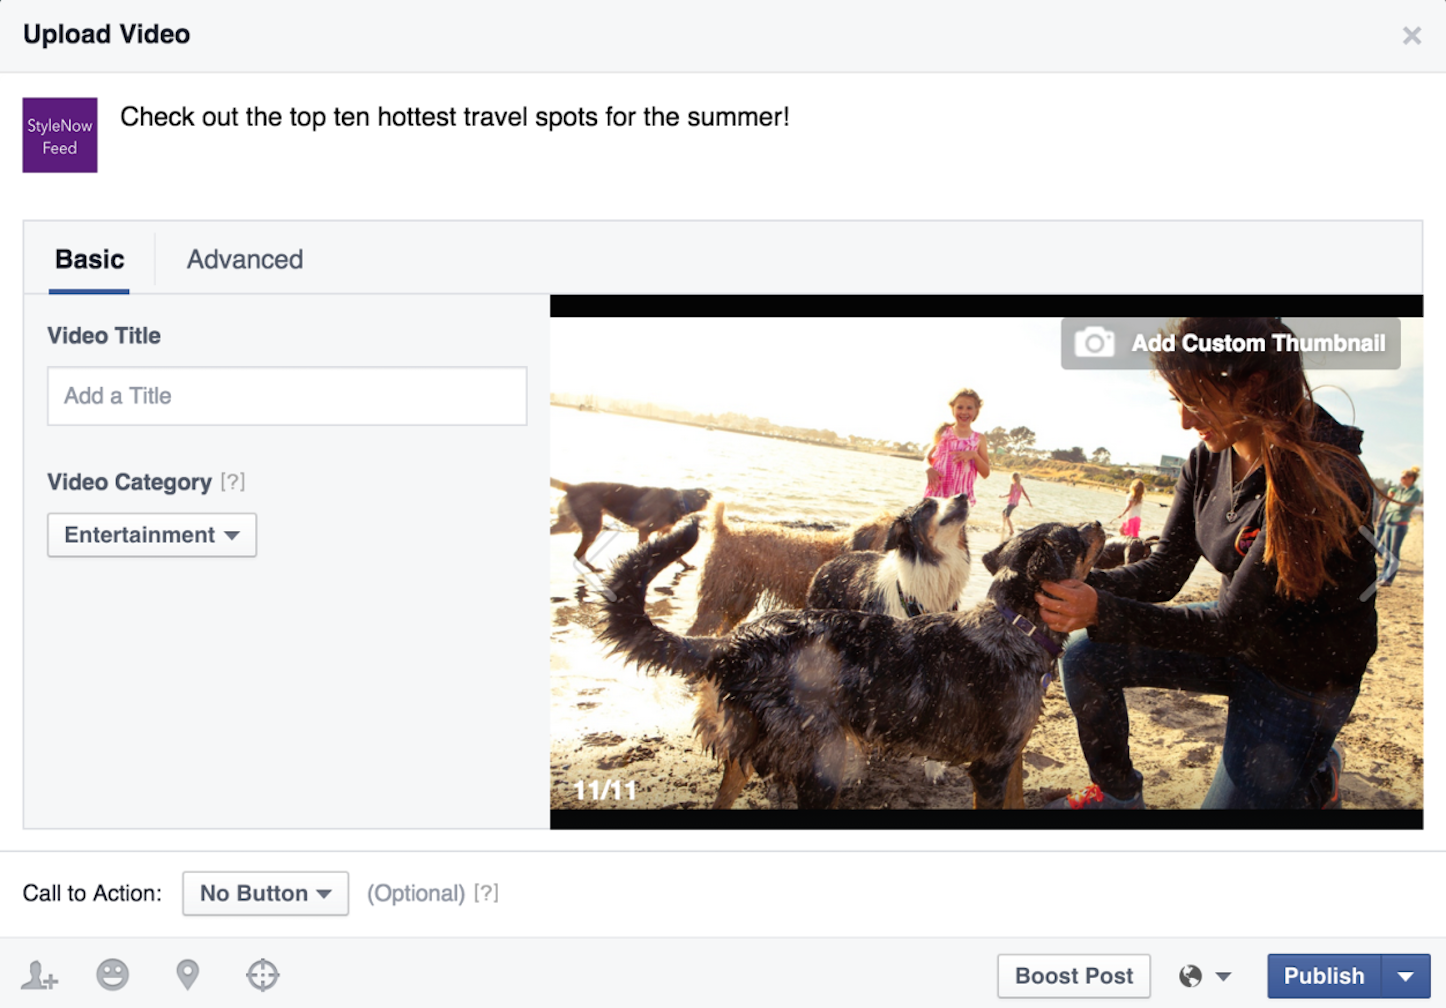 Video upload flow basic options